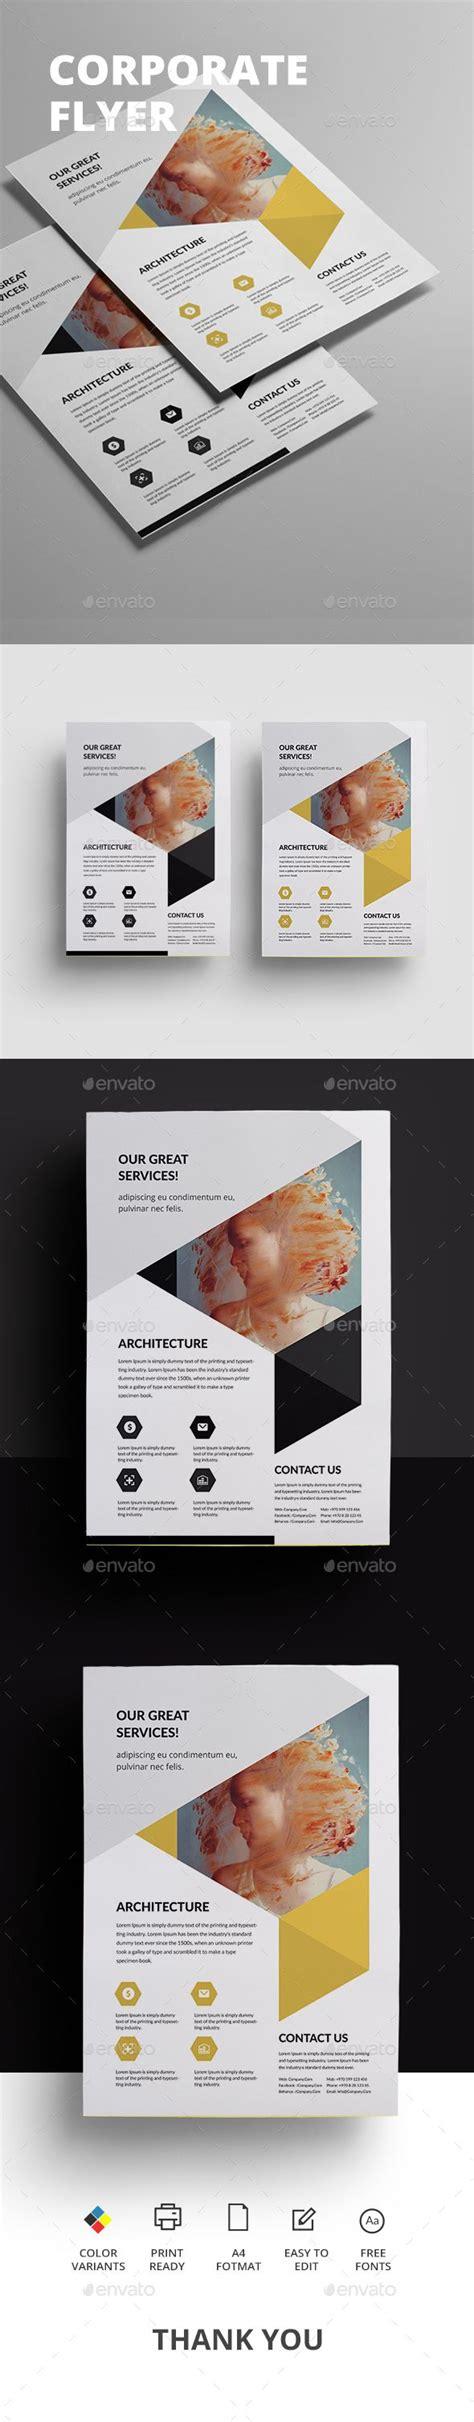 leaflet design help the 25 best flyers ideas on pinterest flyer design